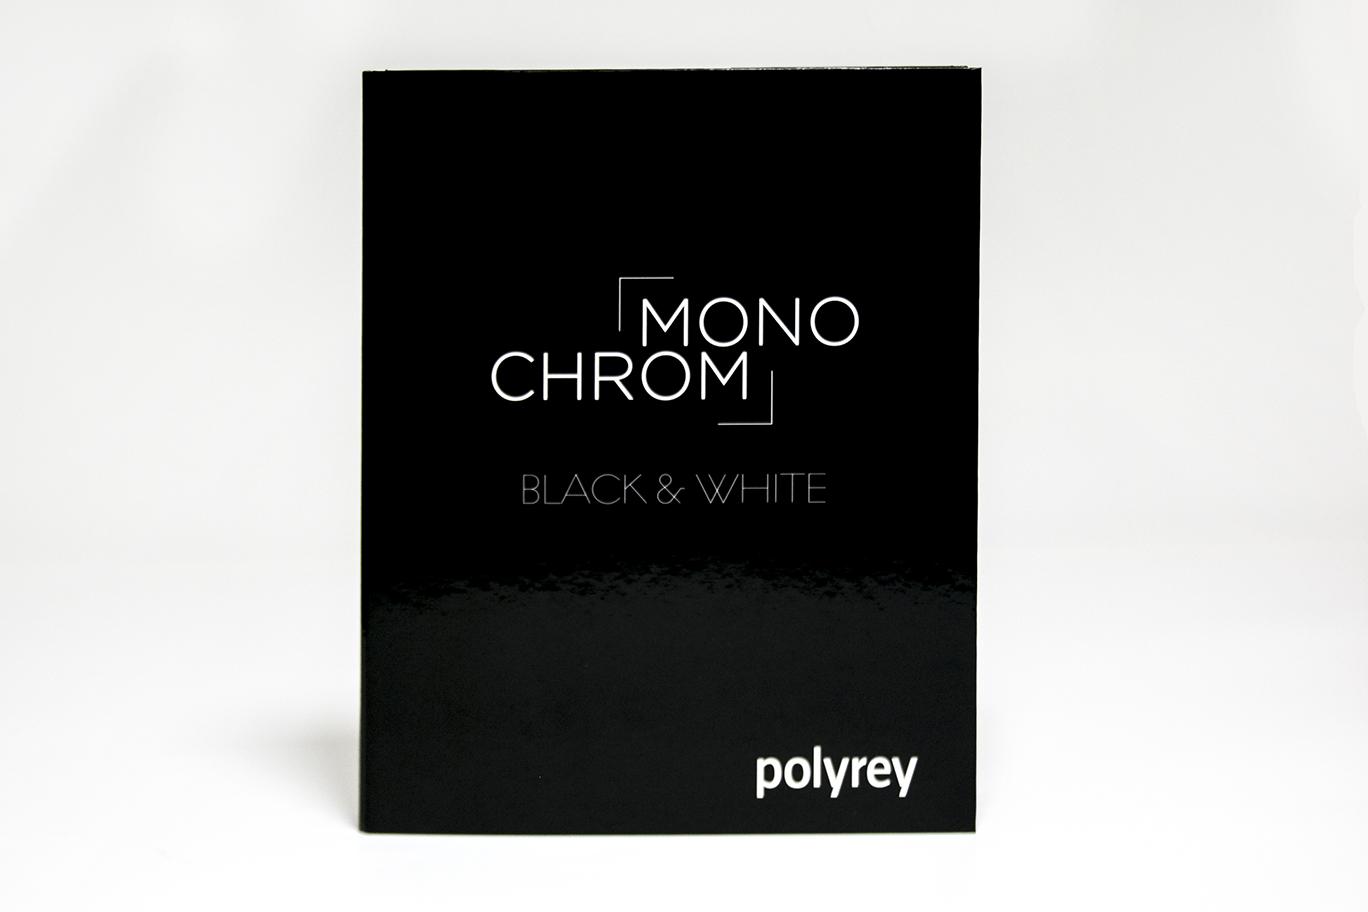 monocromo